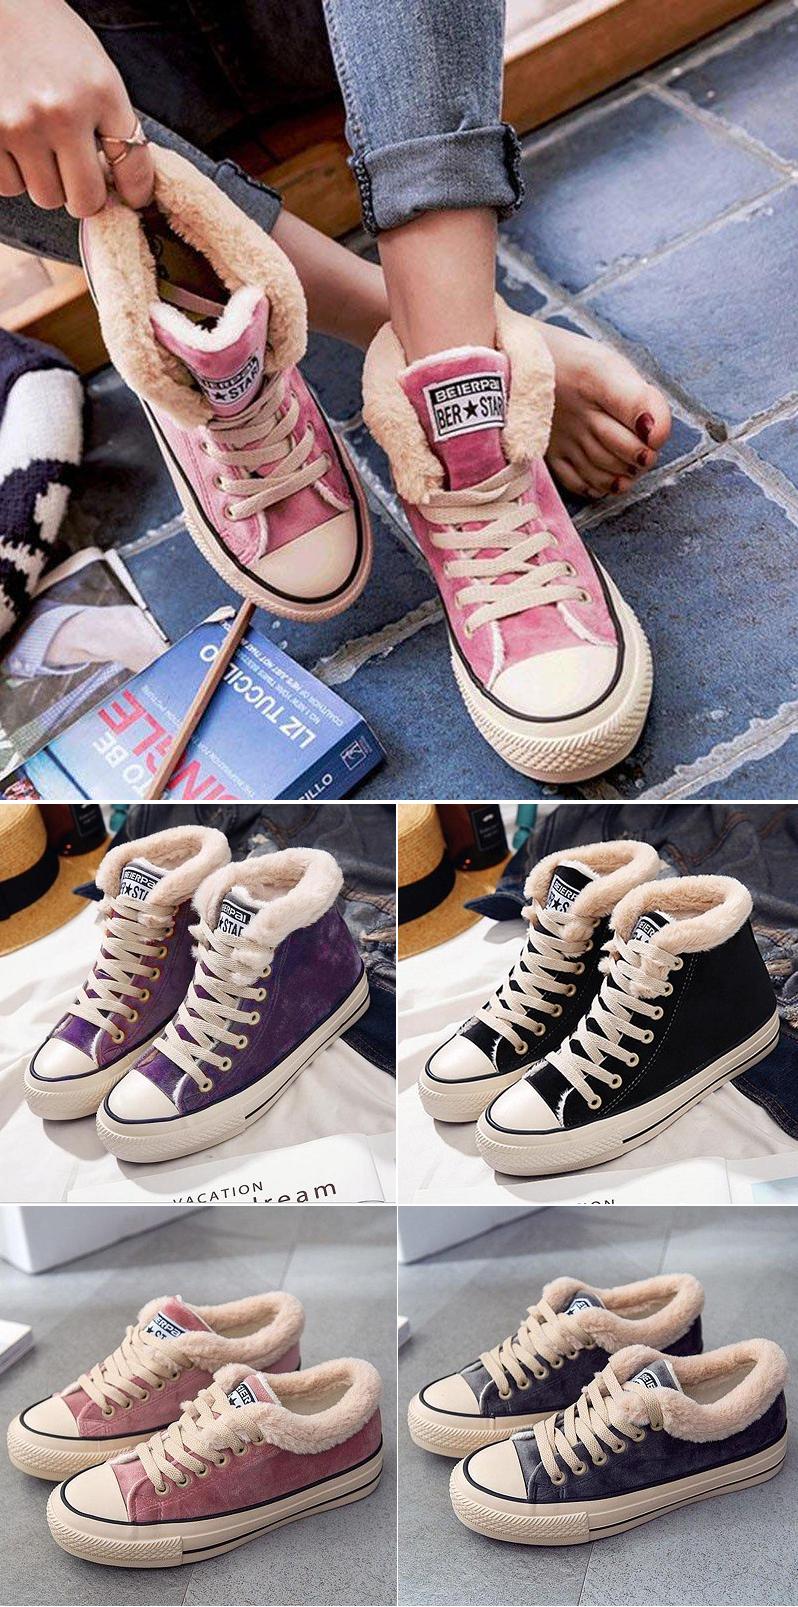 b88caac985e7b Ladies Shoes ·  45.99 USD Sale! Free Shipping! Shop Now! Womens Platform  Canvas Snow Sneakers Snow